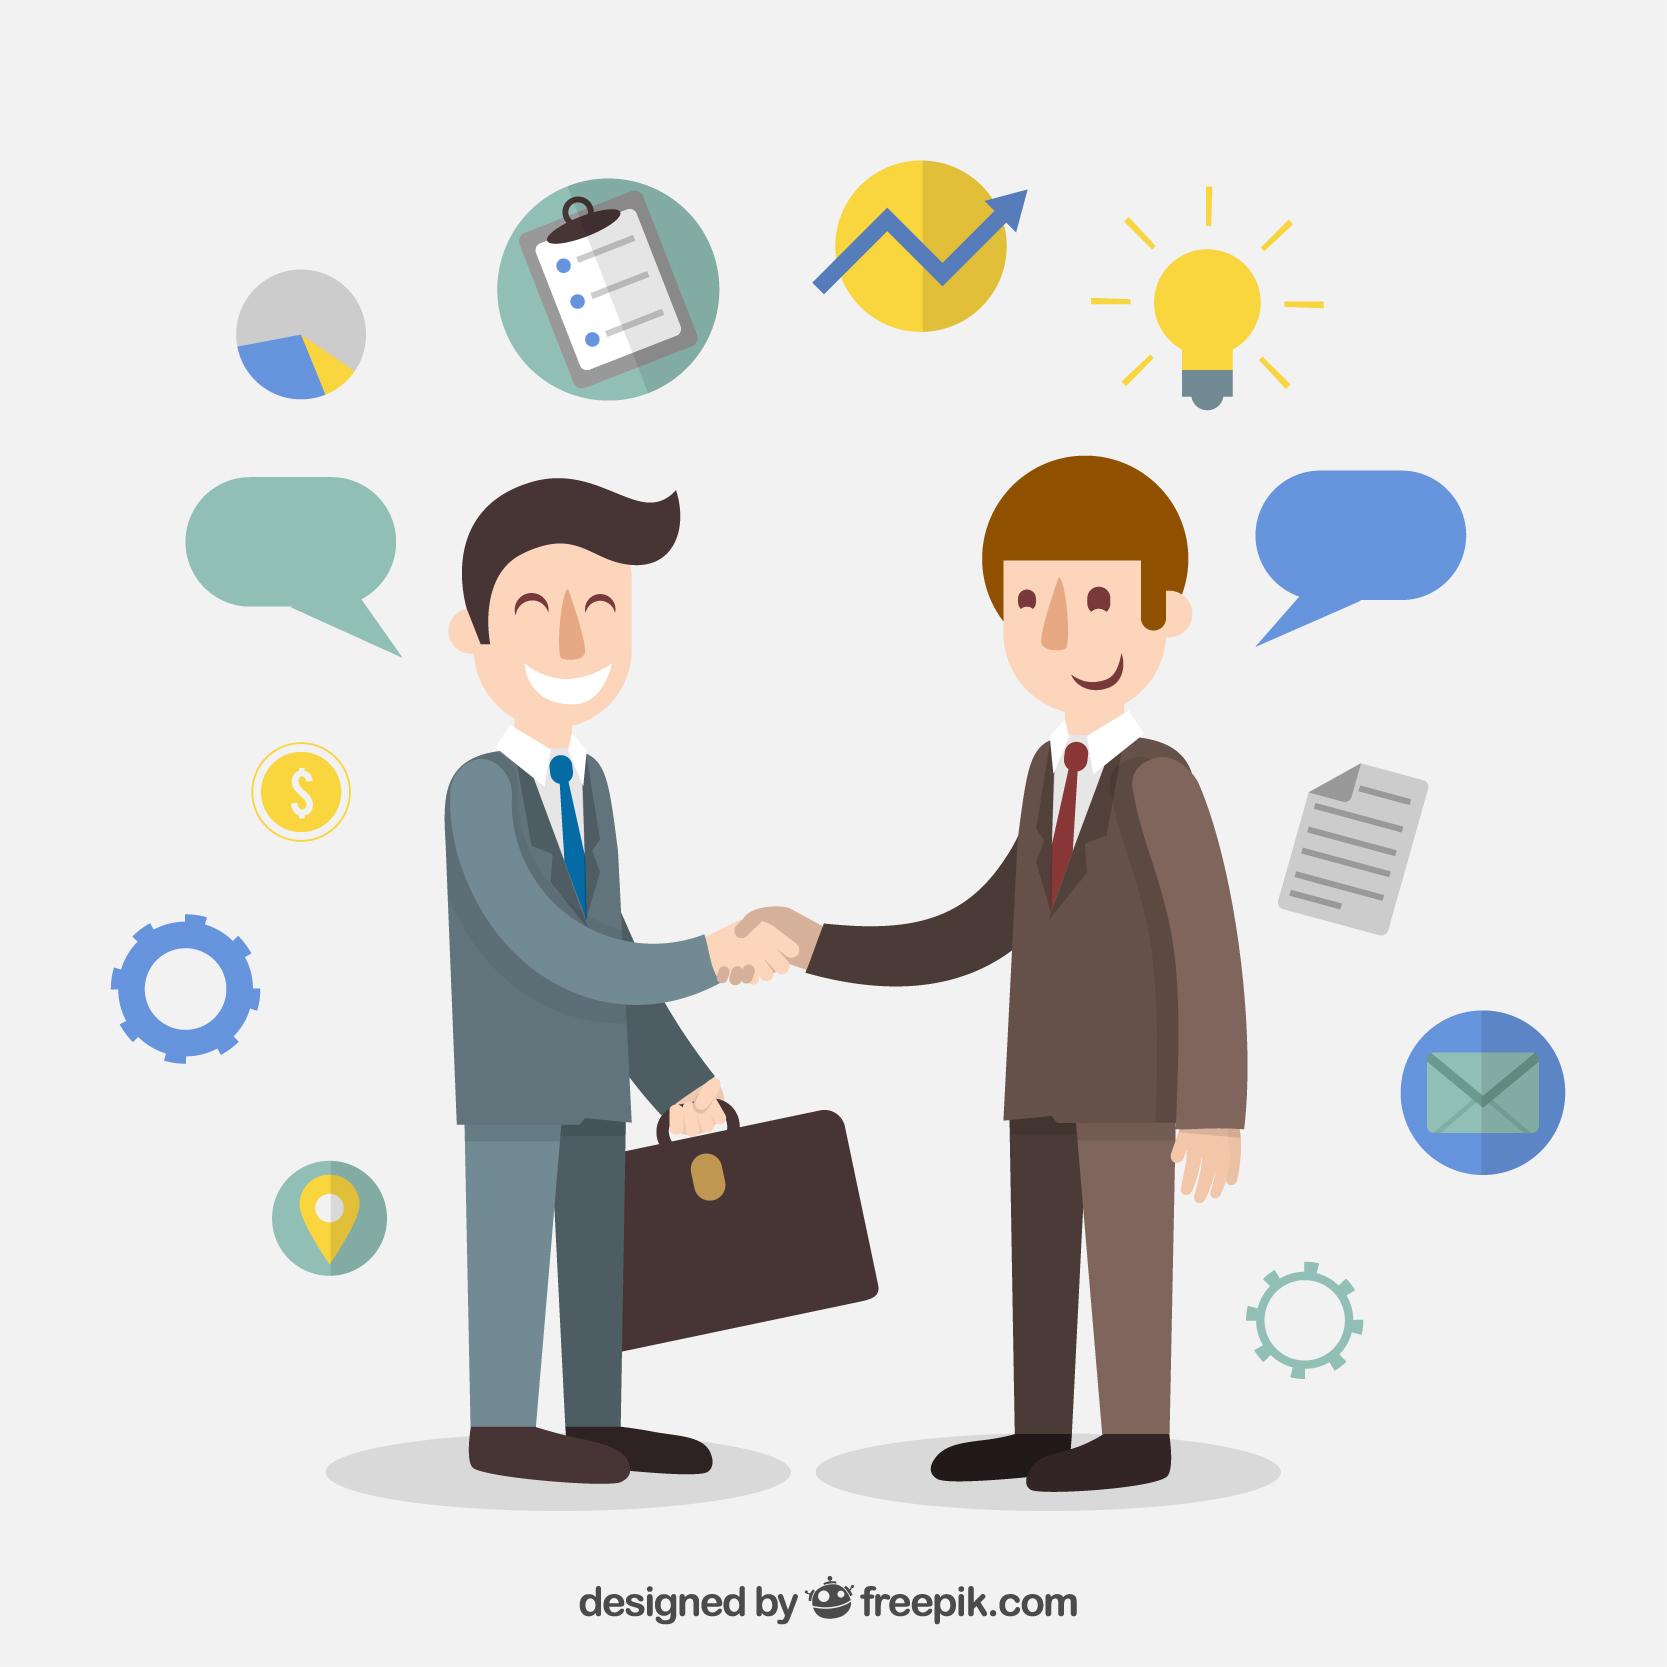 Entenda as necessidades do consumidor e venda mais blog for Jobs als freelancer